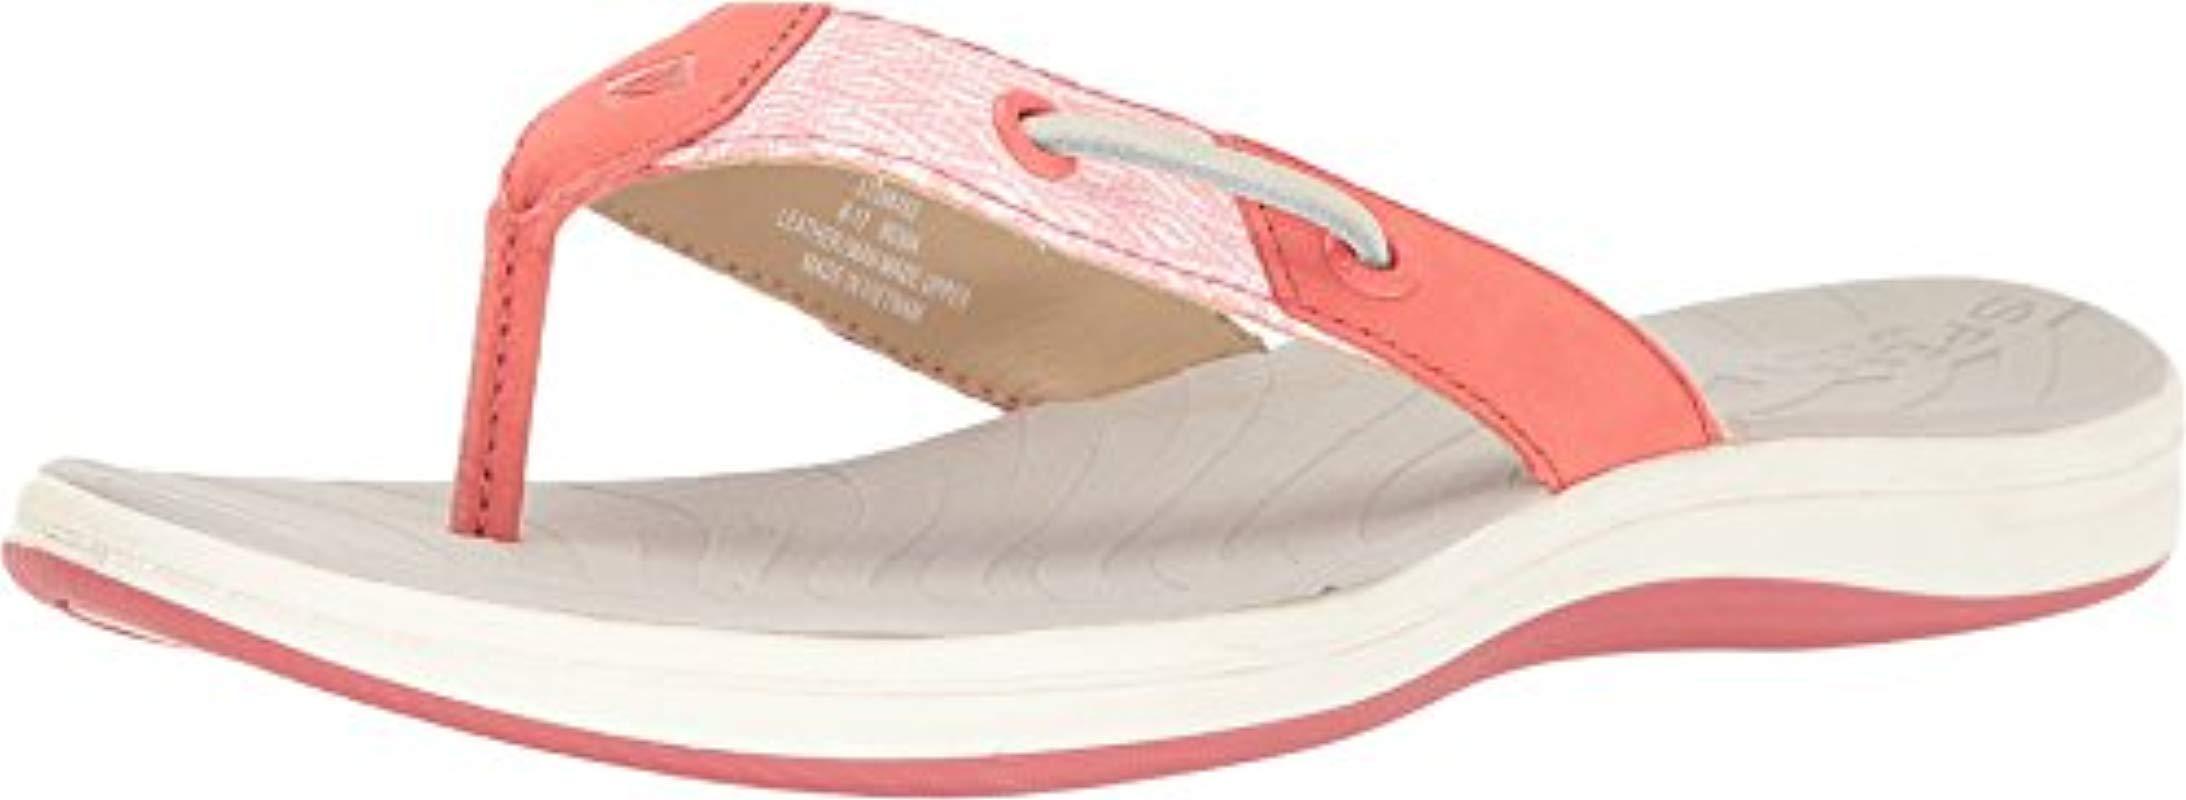 10d2747bd60ea Lyst - Sperry Top-Sider Seabrook Surf Mesh Flip Flop in Pink